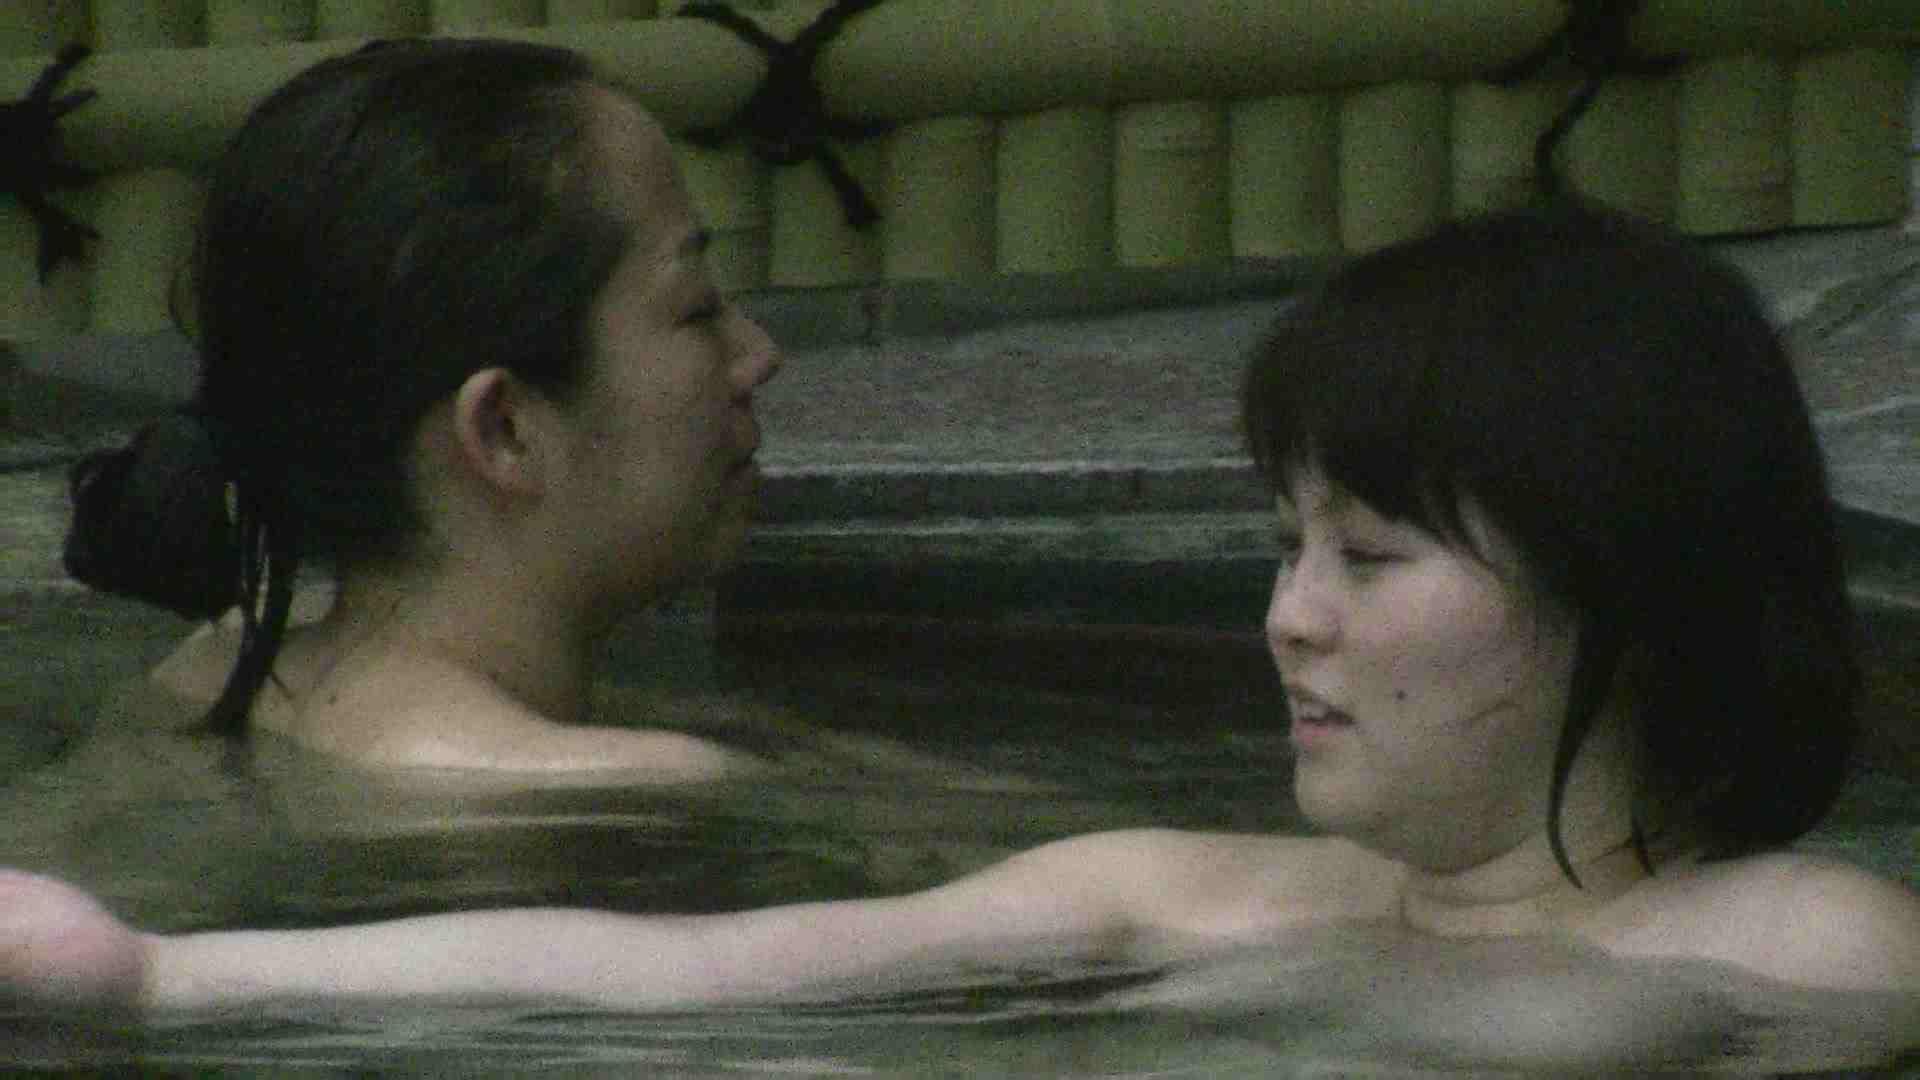 Aquaな露天風呂Vol.539 OL女体  88連発 81